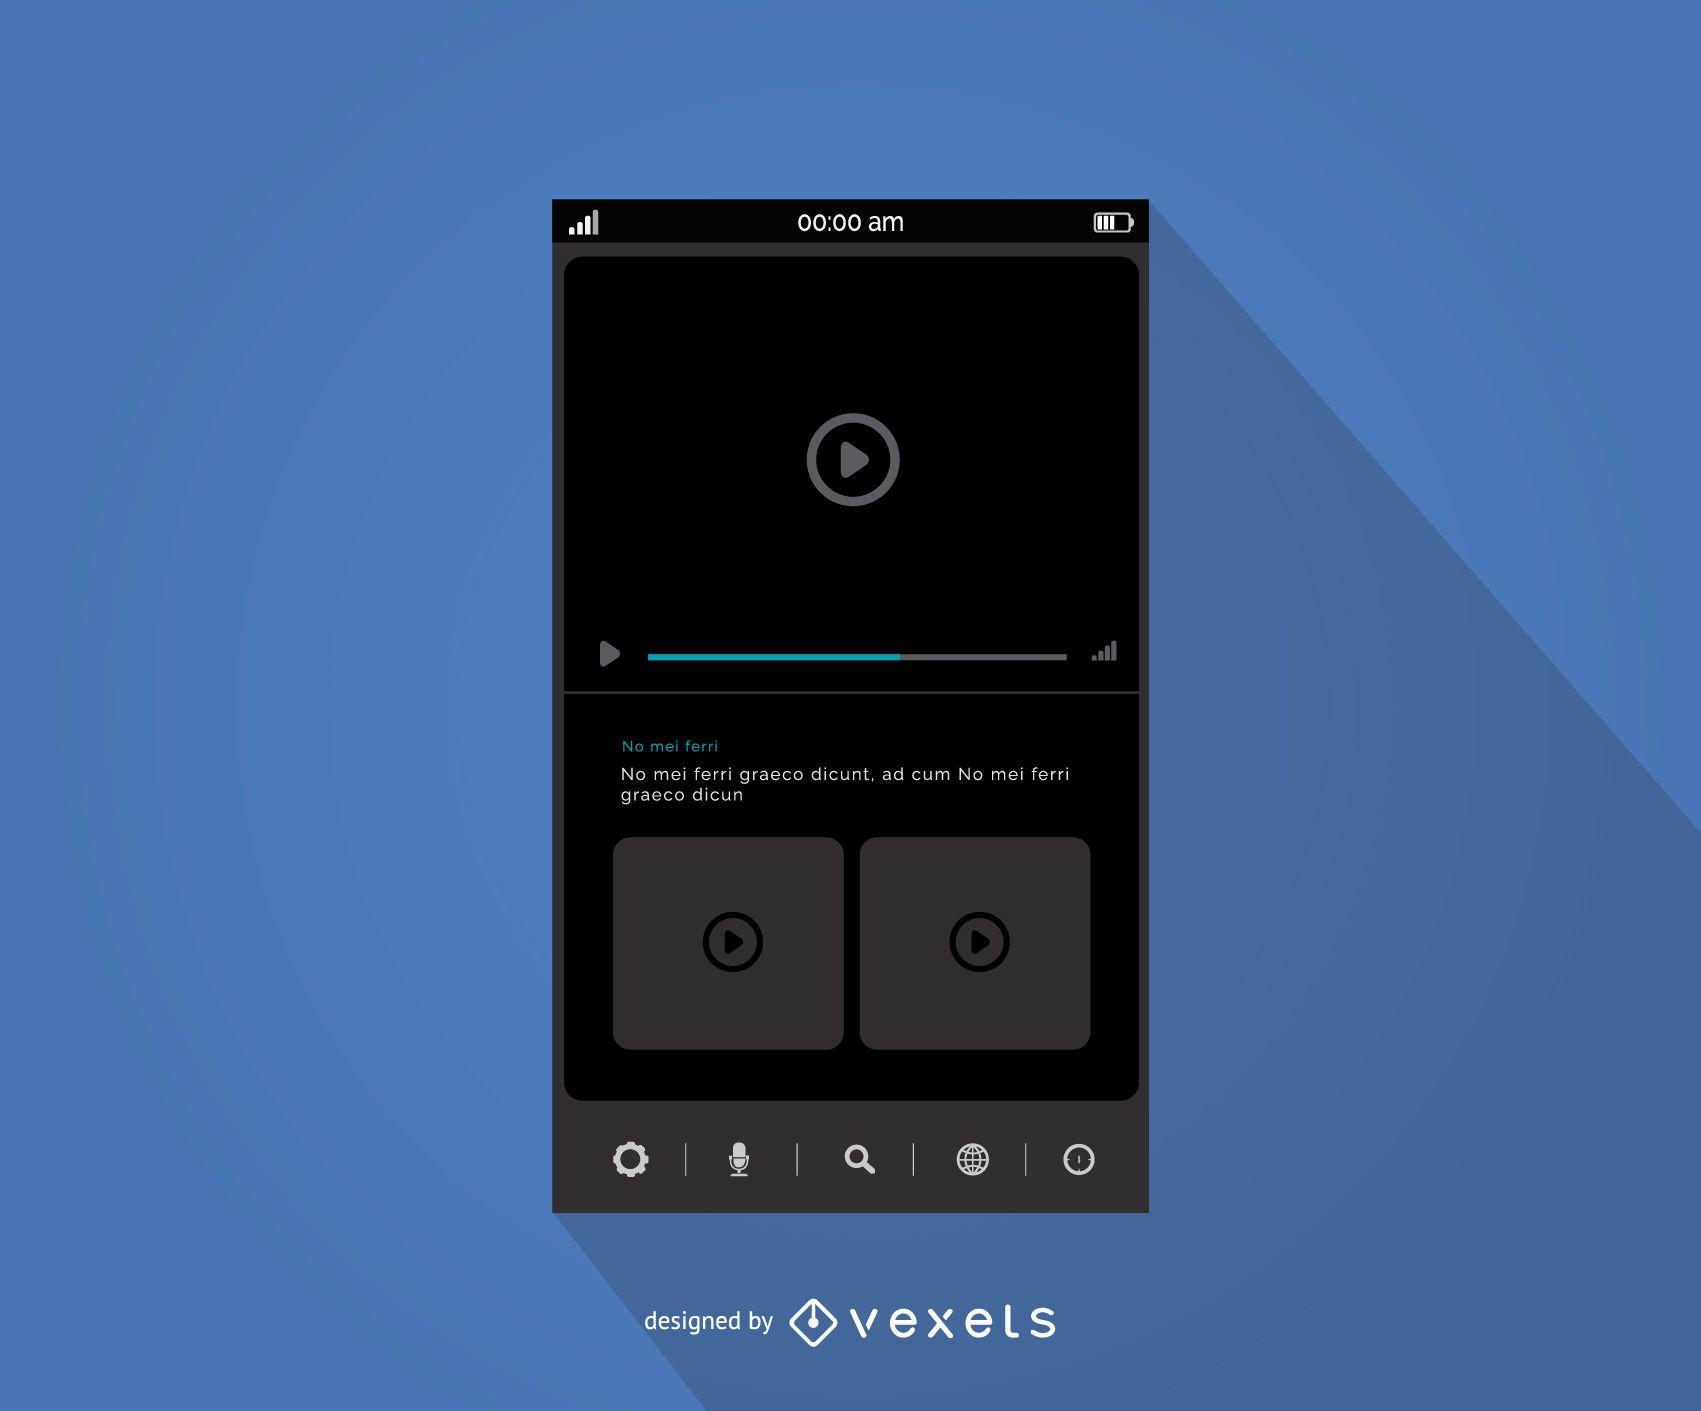 Mobile media player interface design